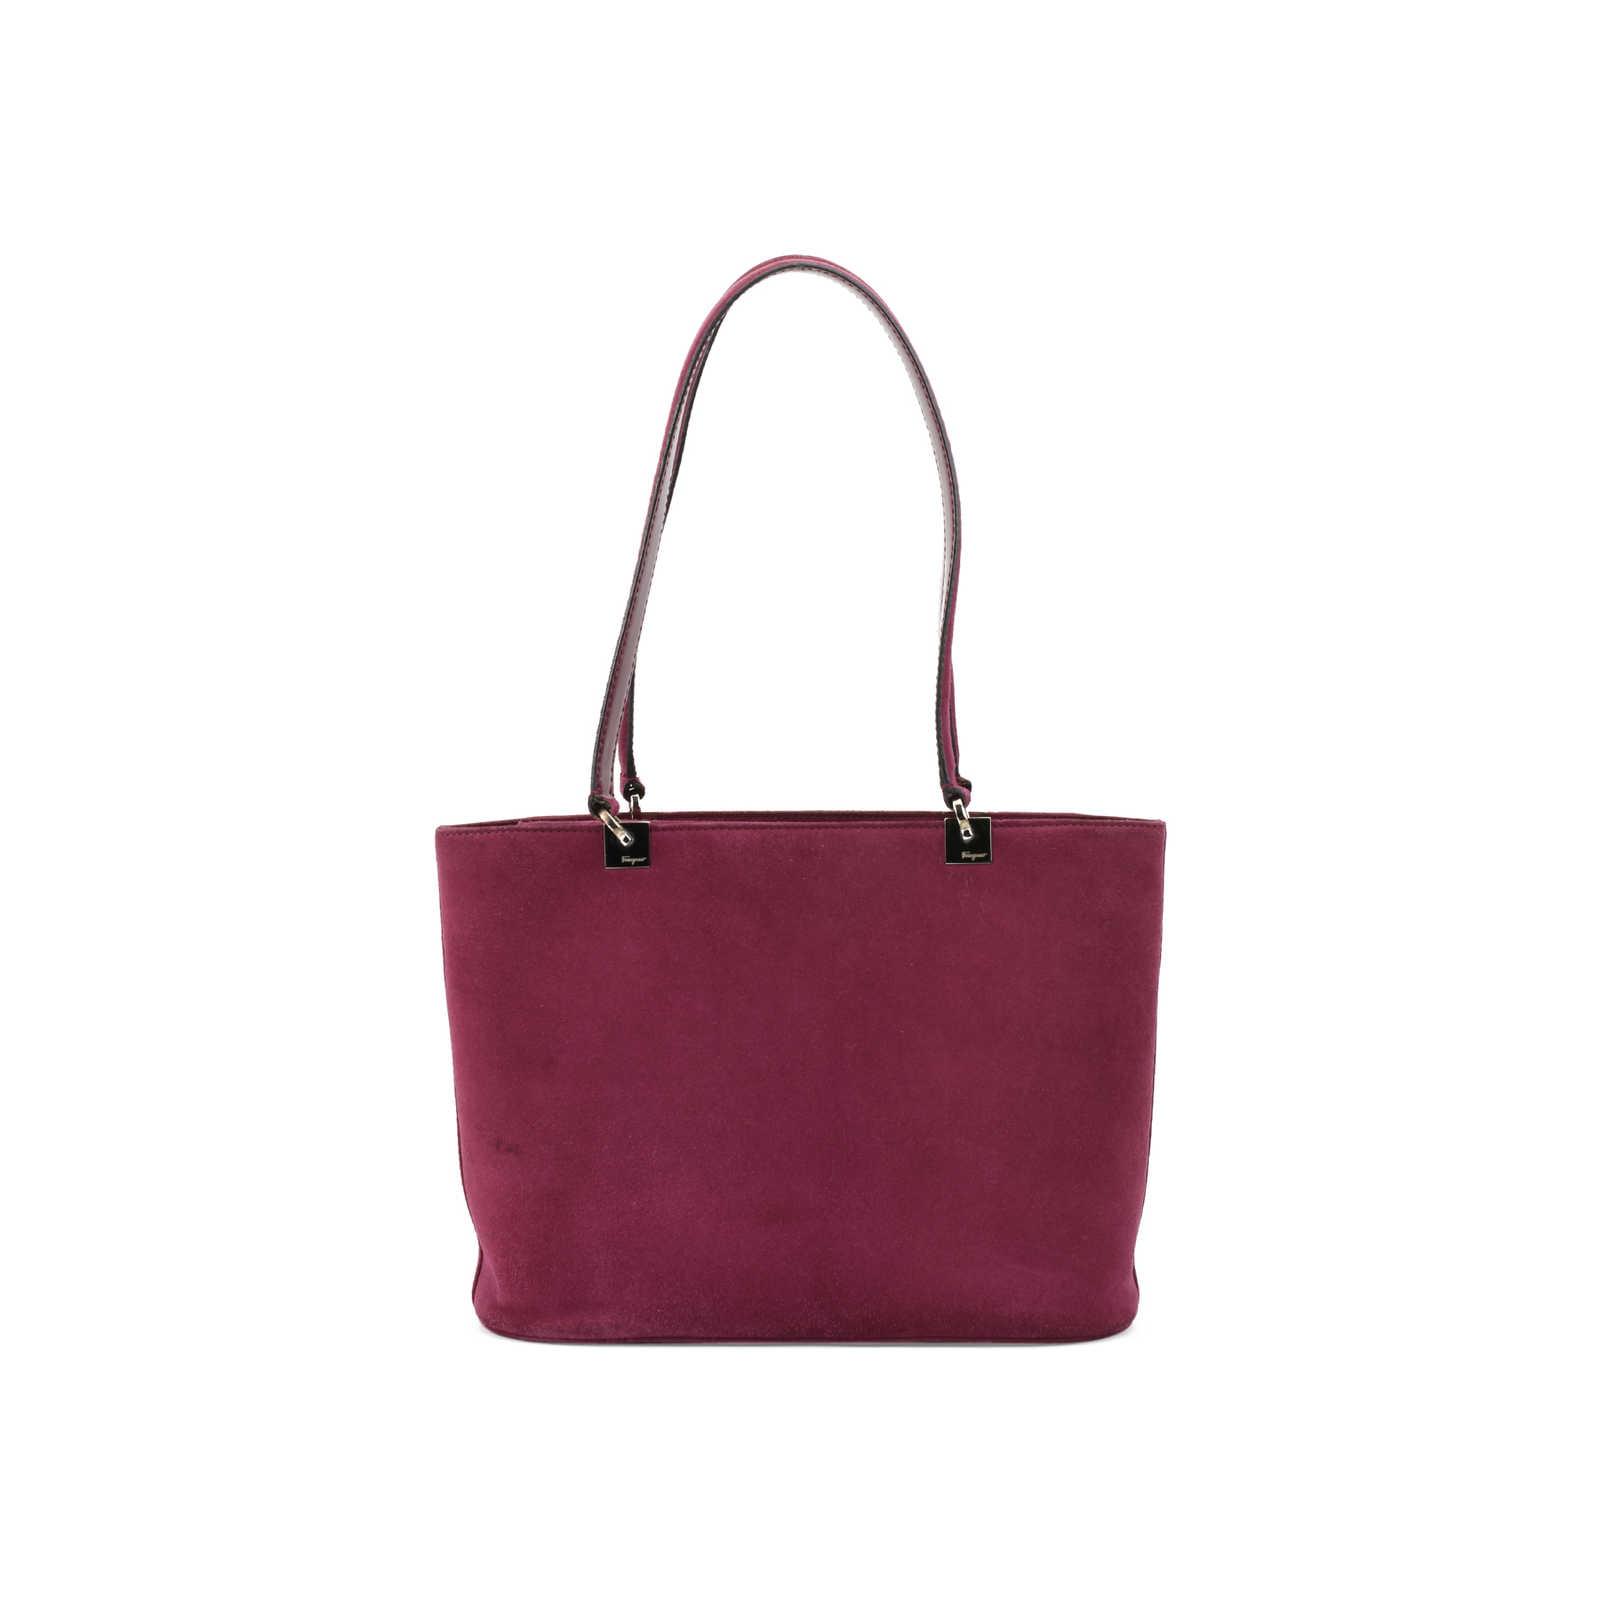 7a42bd41cd8d ... Authentic Second Hand Salvatore Ferragamo Suede Tote Handbag  (PSS-377-00050) ...